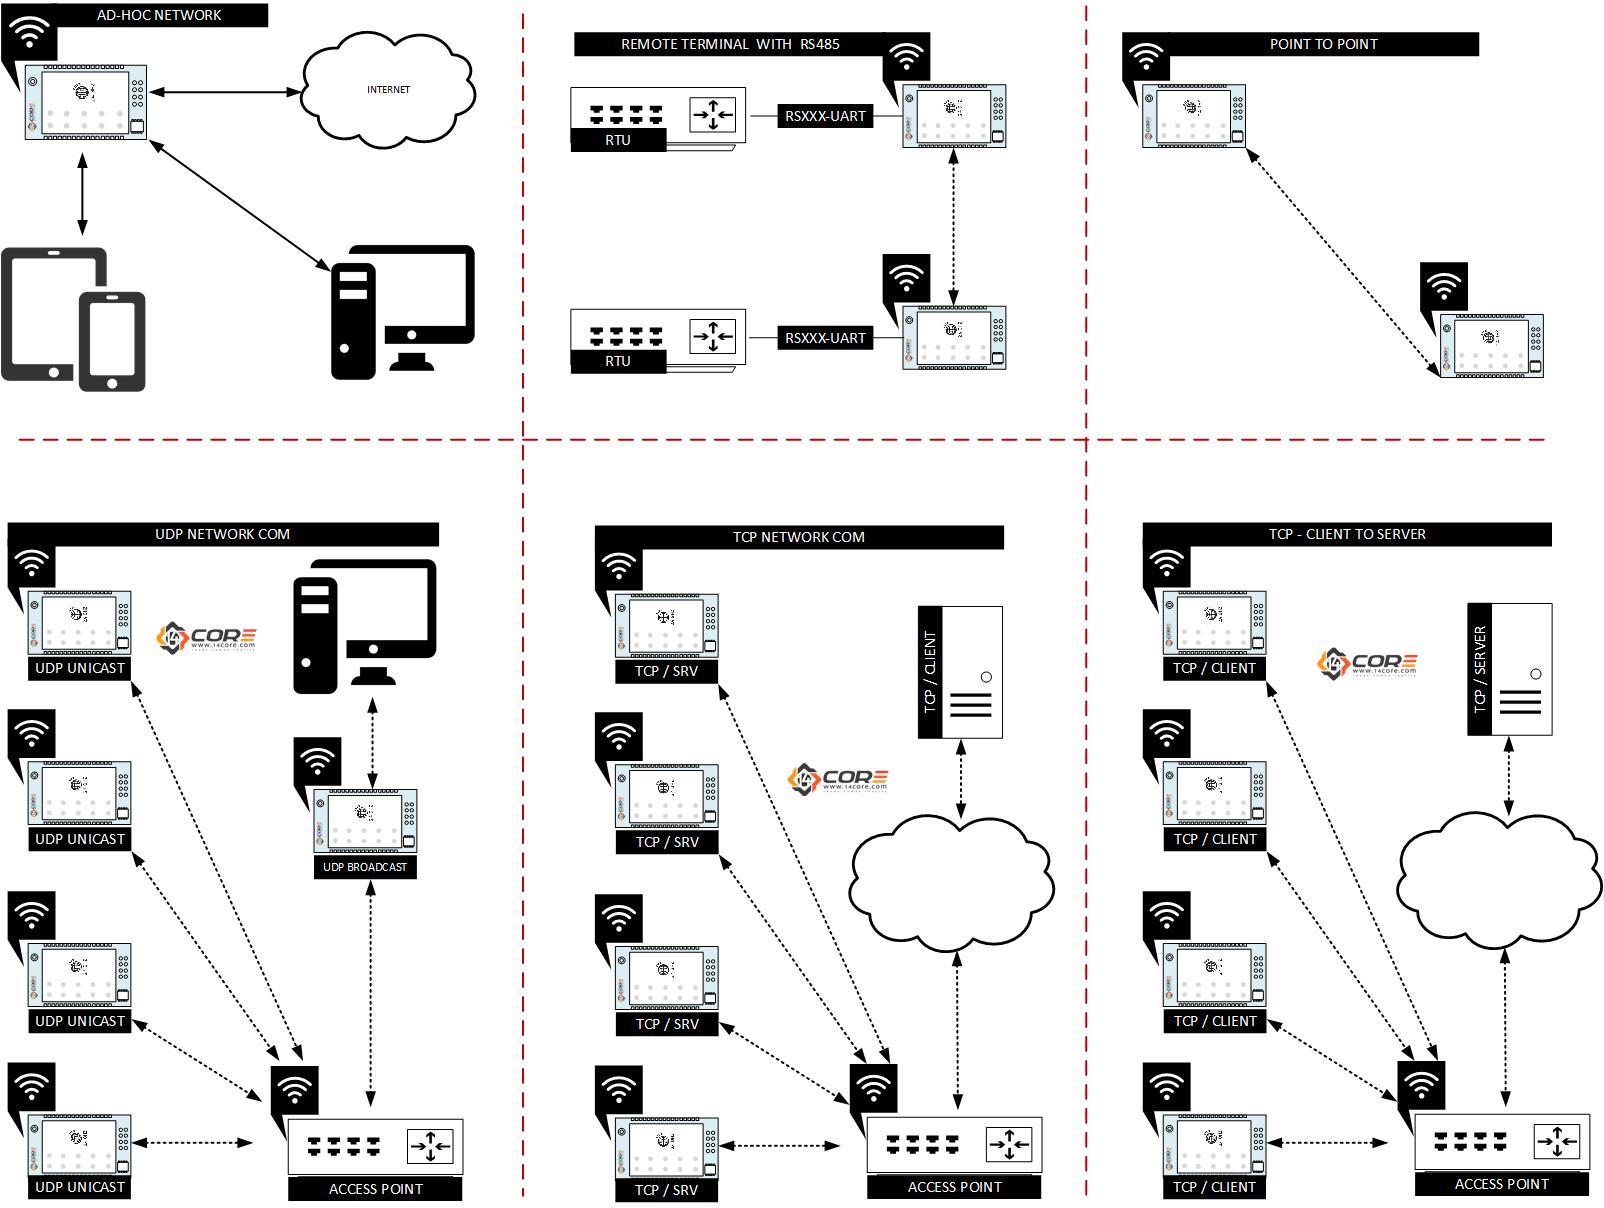 Wiring HC-21 (M02) 2.4GHz Wi-Fi Serial Universal